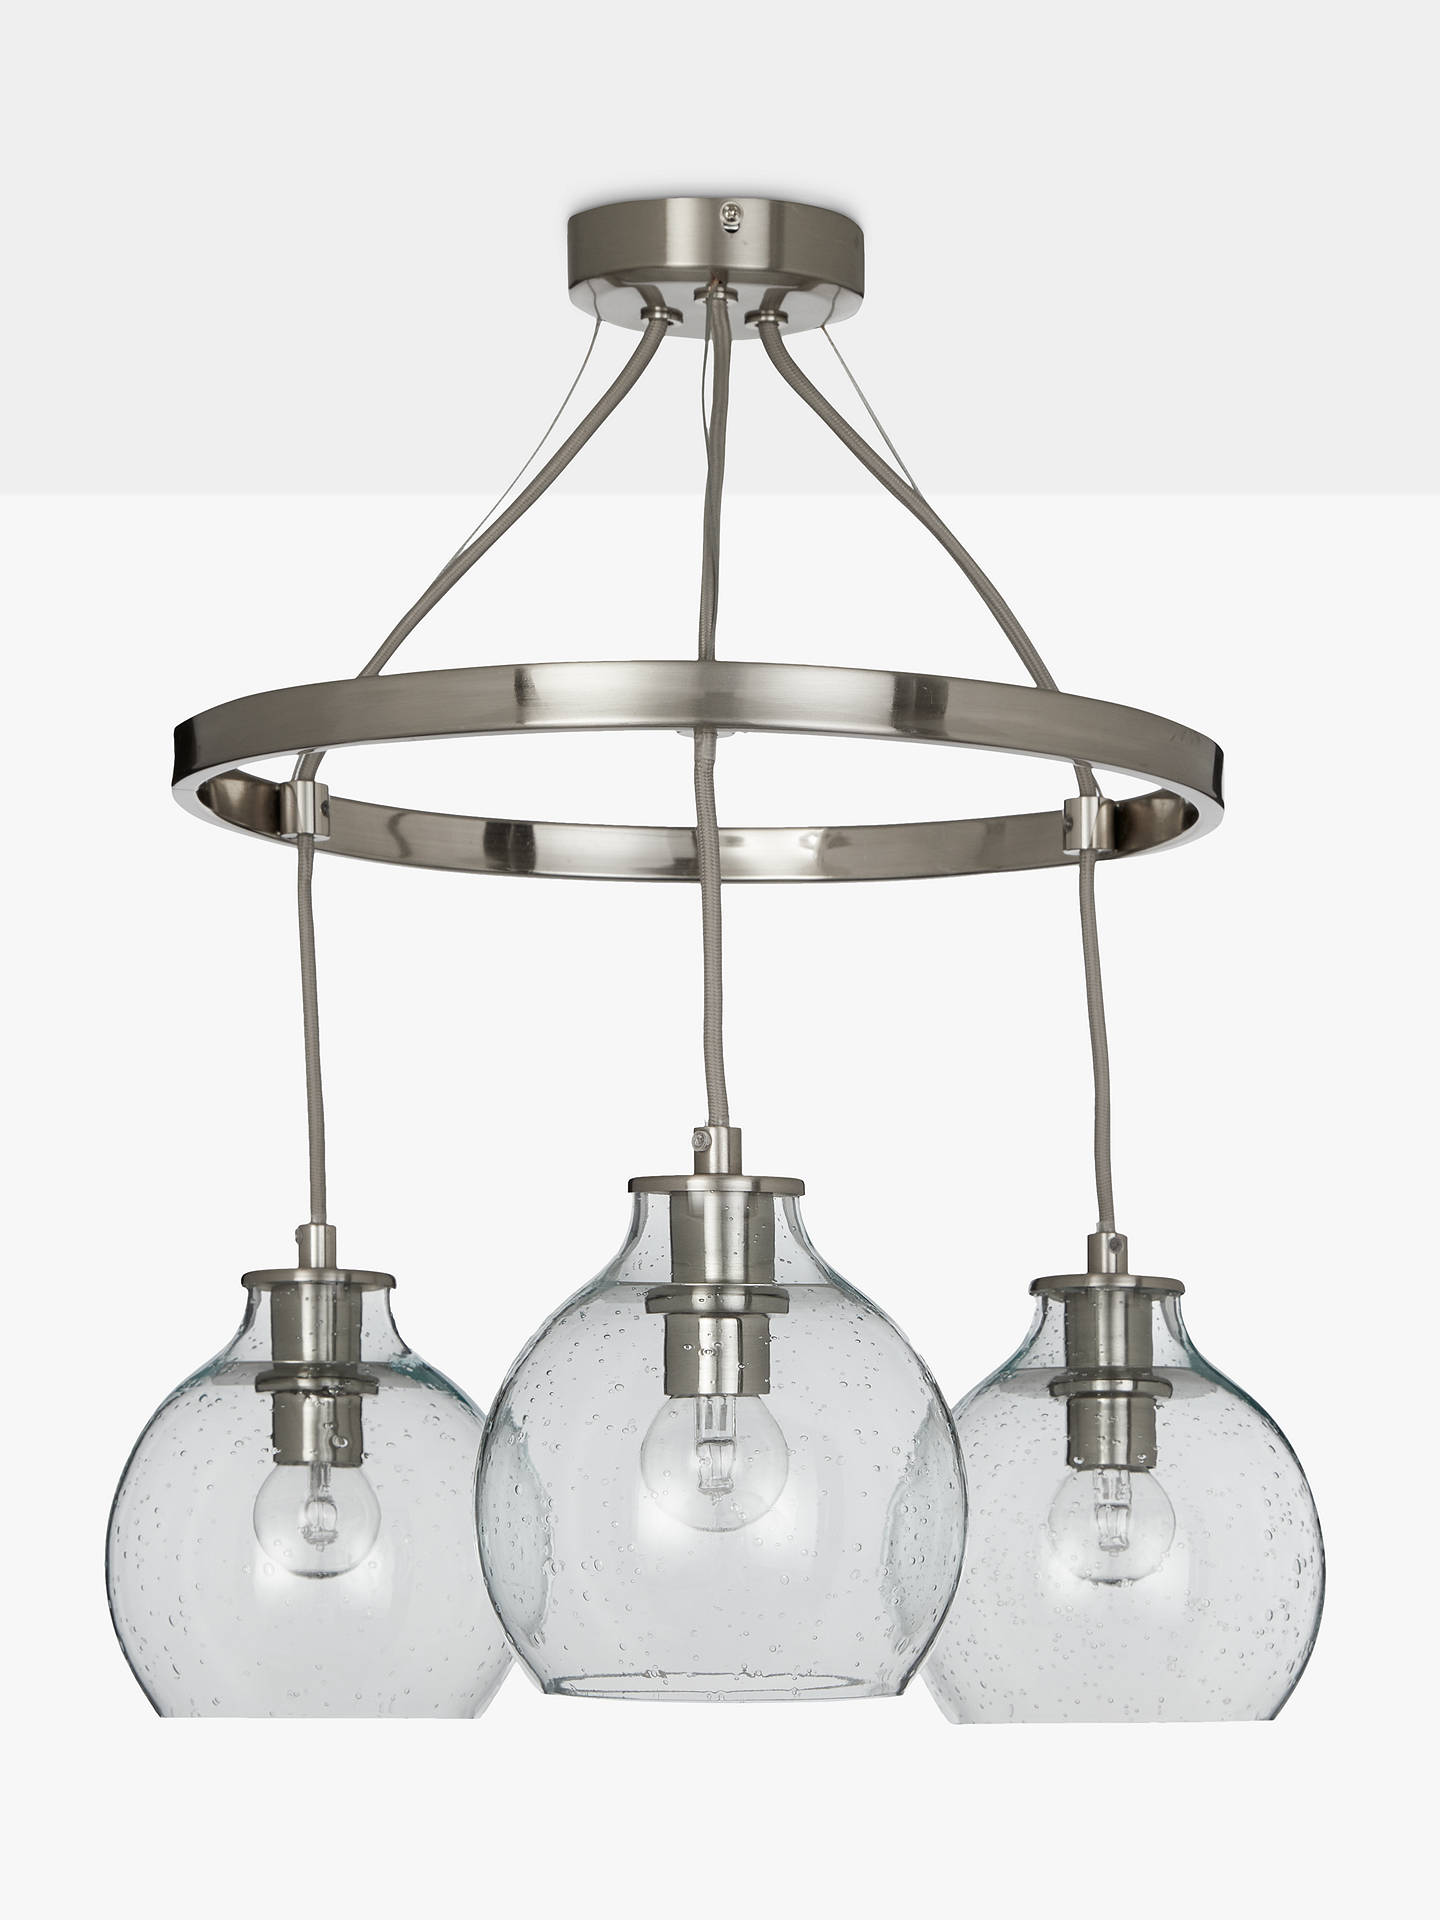 Croft Collection Selsey Semi Flush 3 Pendant Ceiling Light Blue Antler Lamp Wiring Kit Buycroft Chrome Online At